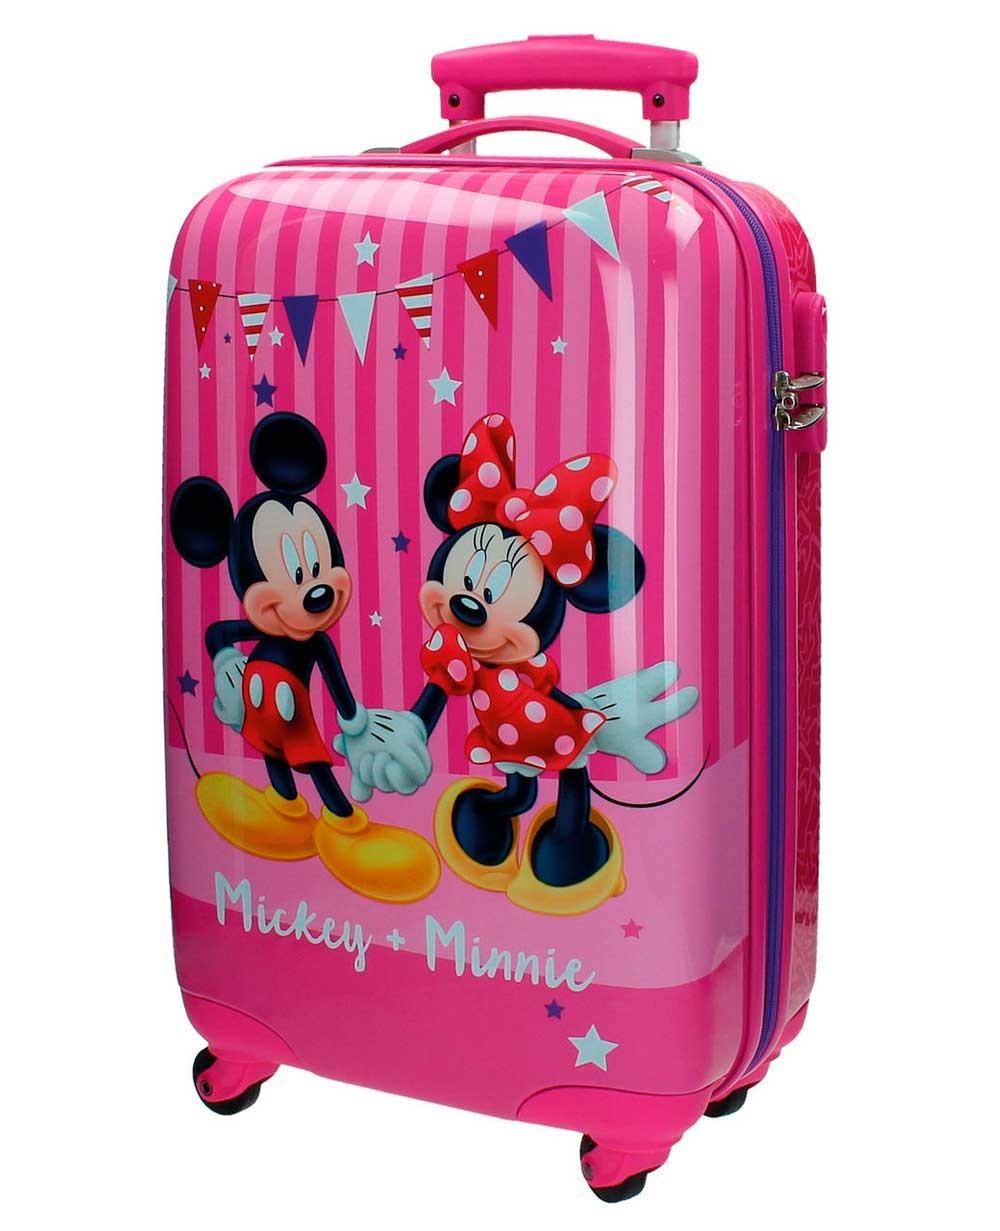 Disney Mickey & Minnie Maleta de mano Rosa (Foto )